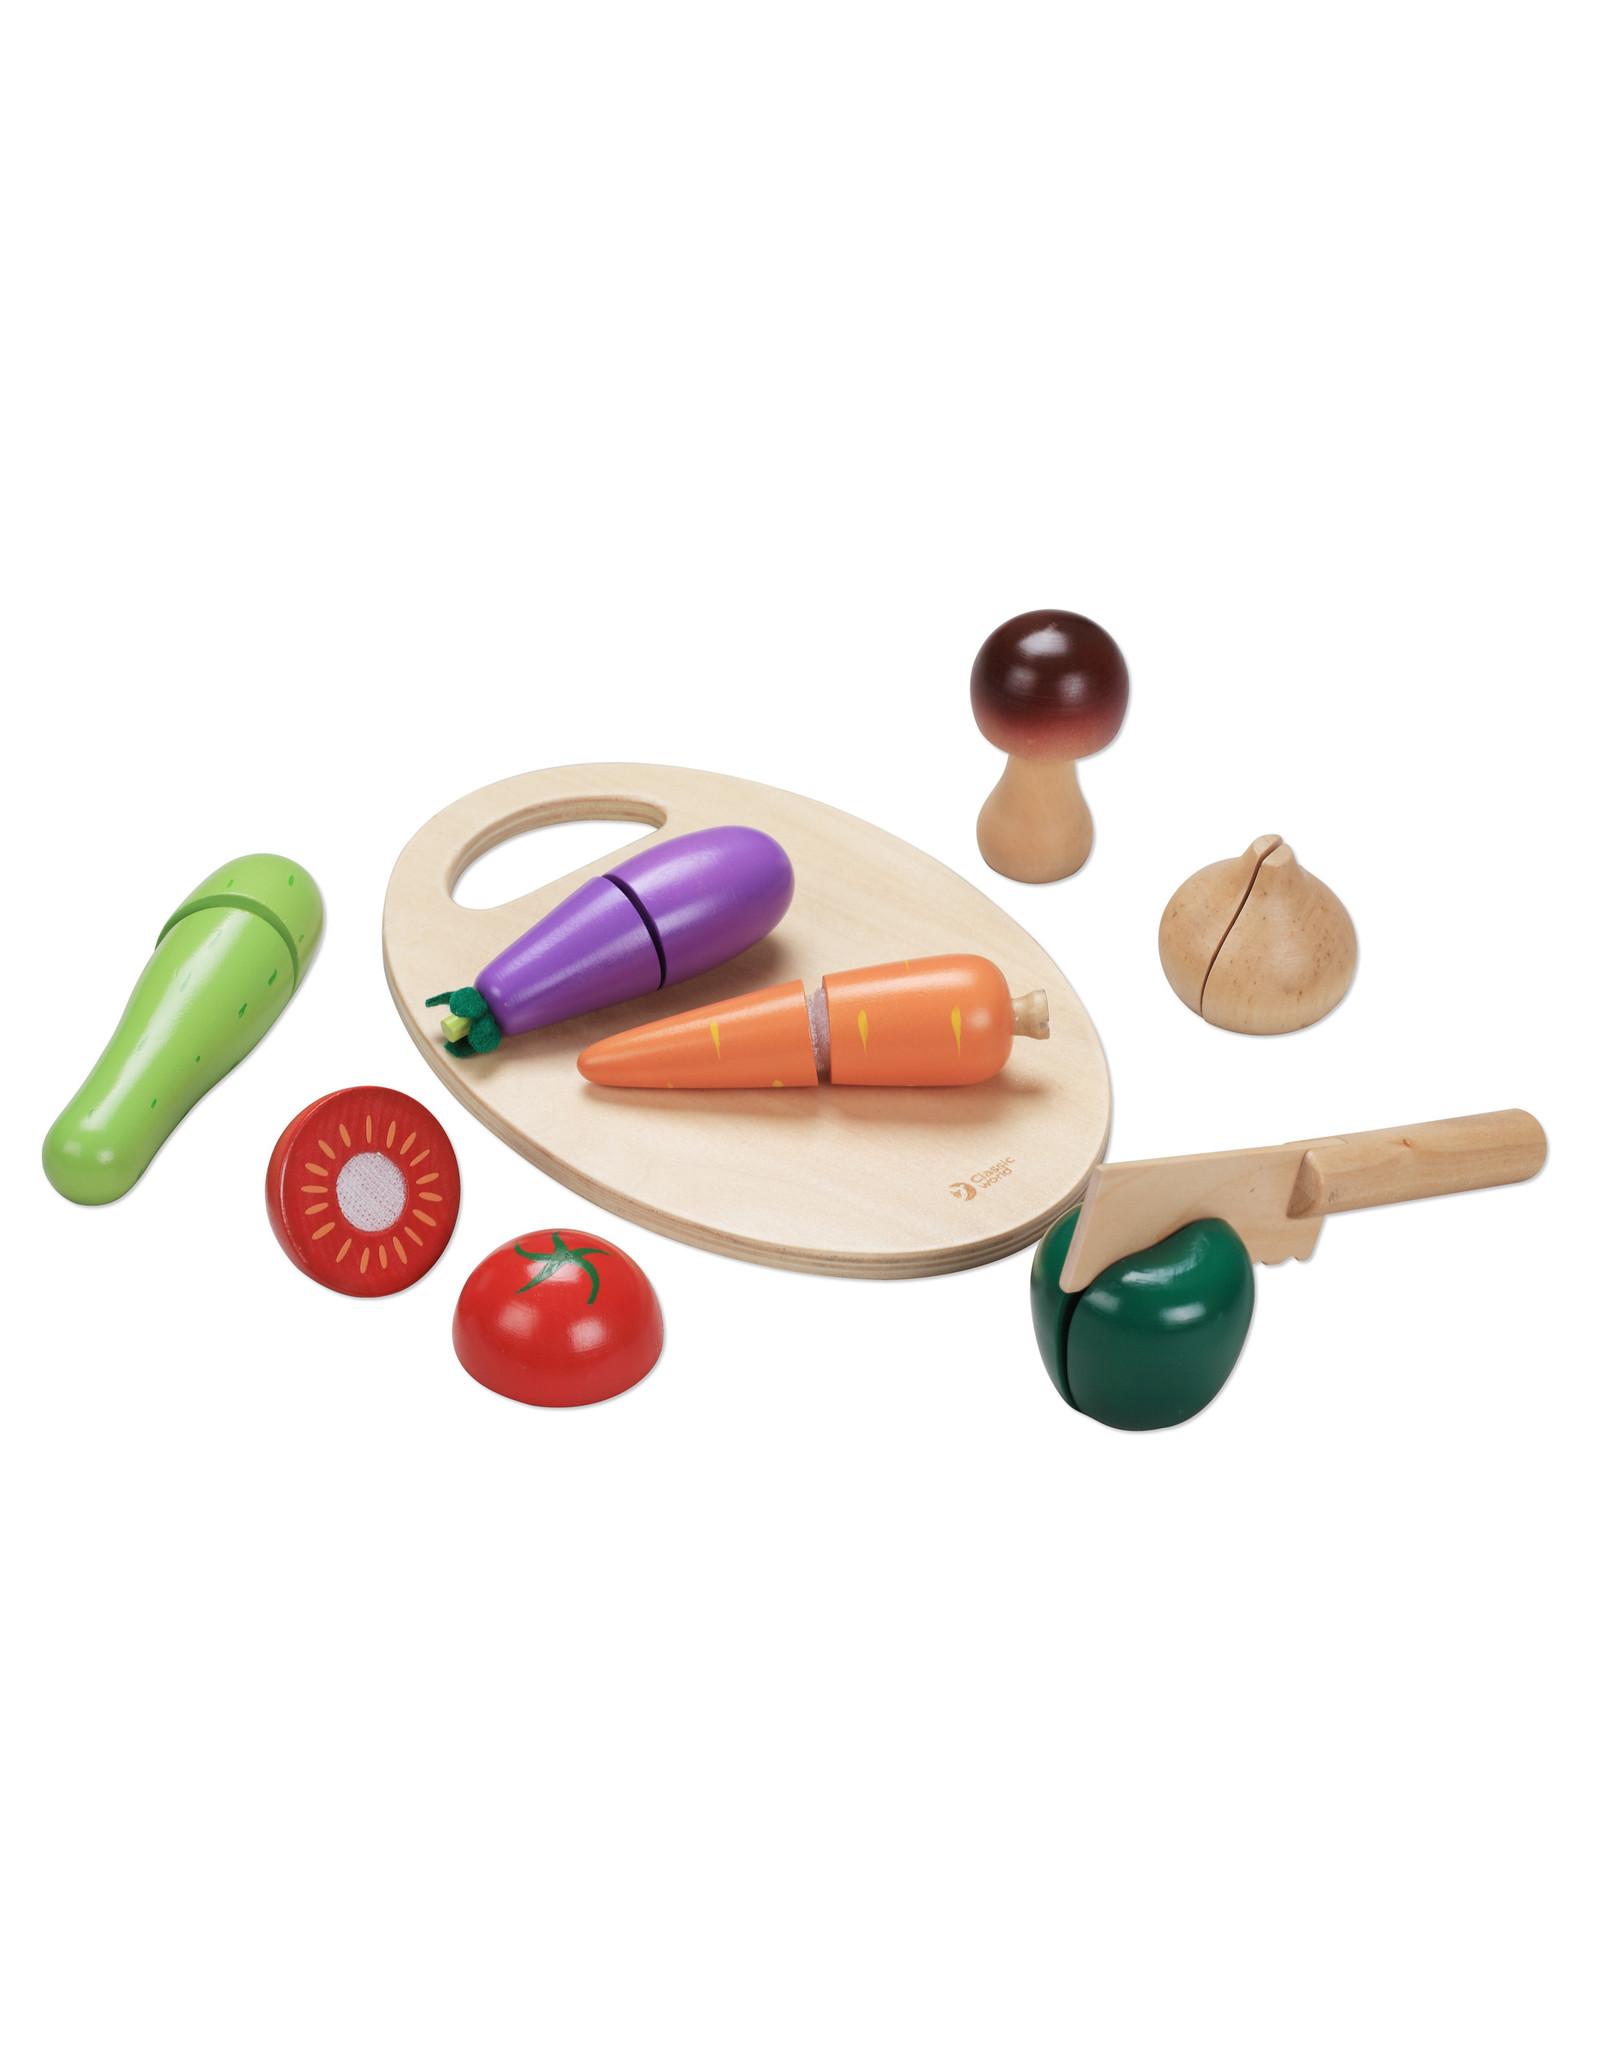 Classic World Classic World Cutting Vegetable Set